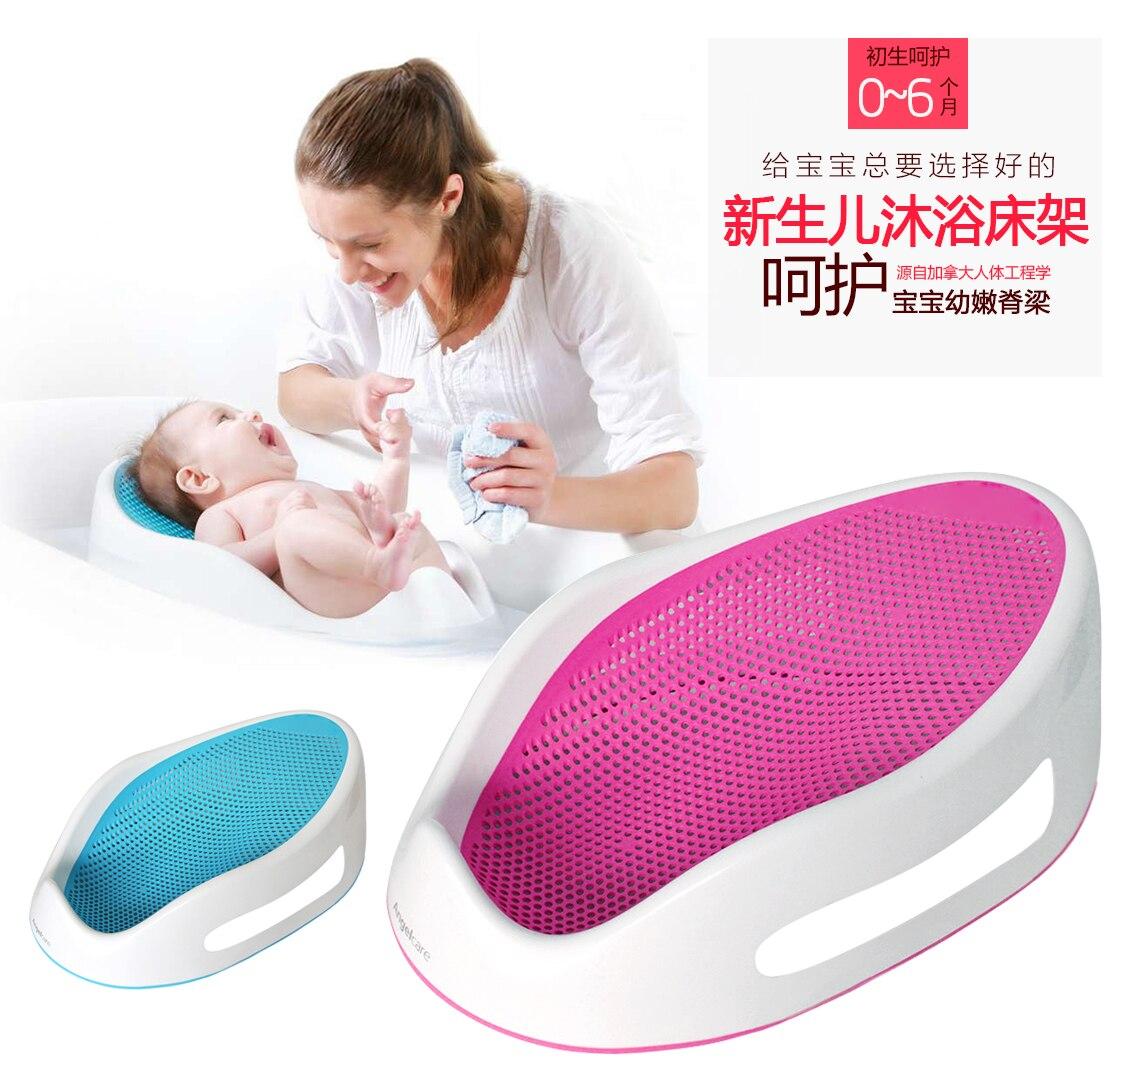 Bathtub Sitting Chair For Baby Home Massage Comfortable Bath Mesh Tub Aircraft